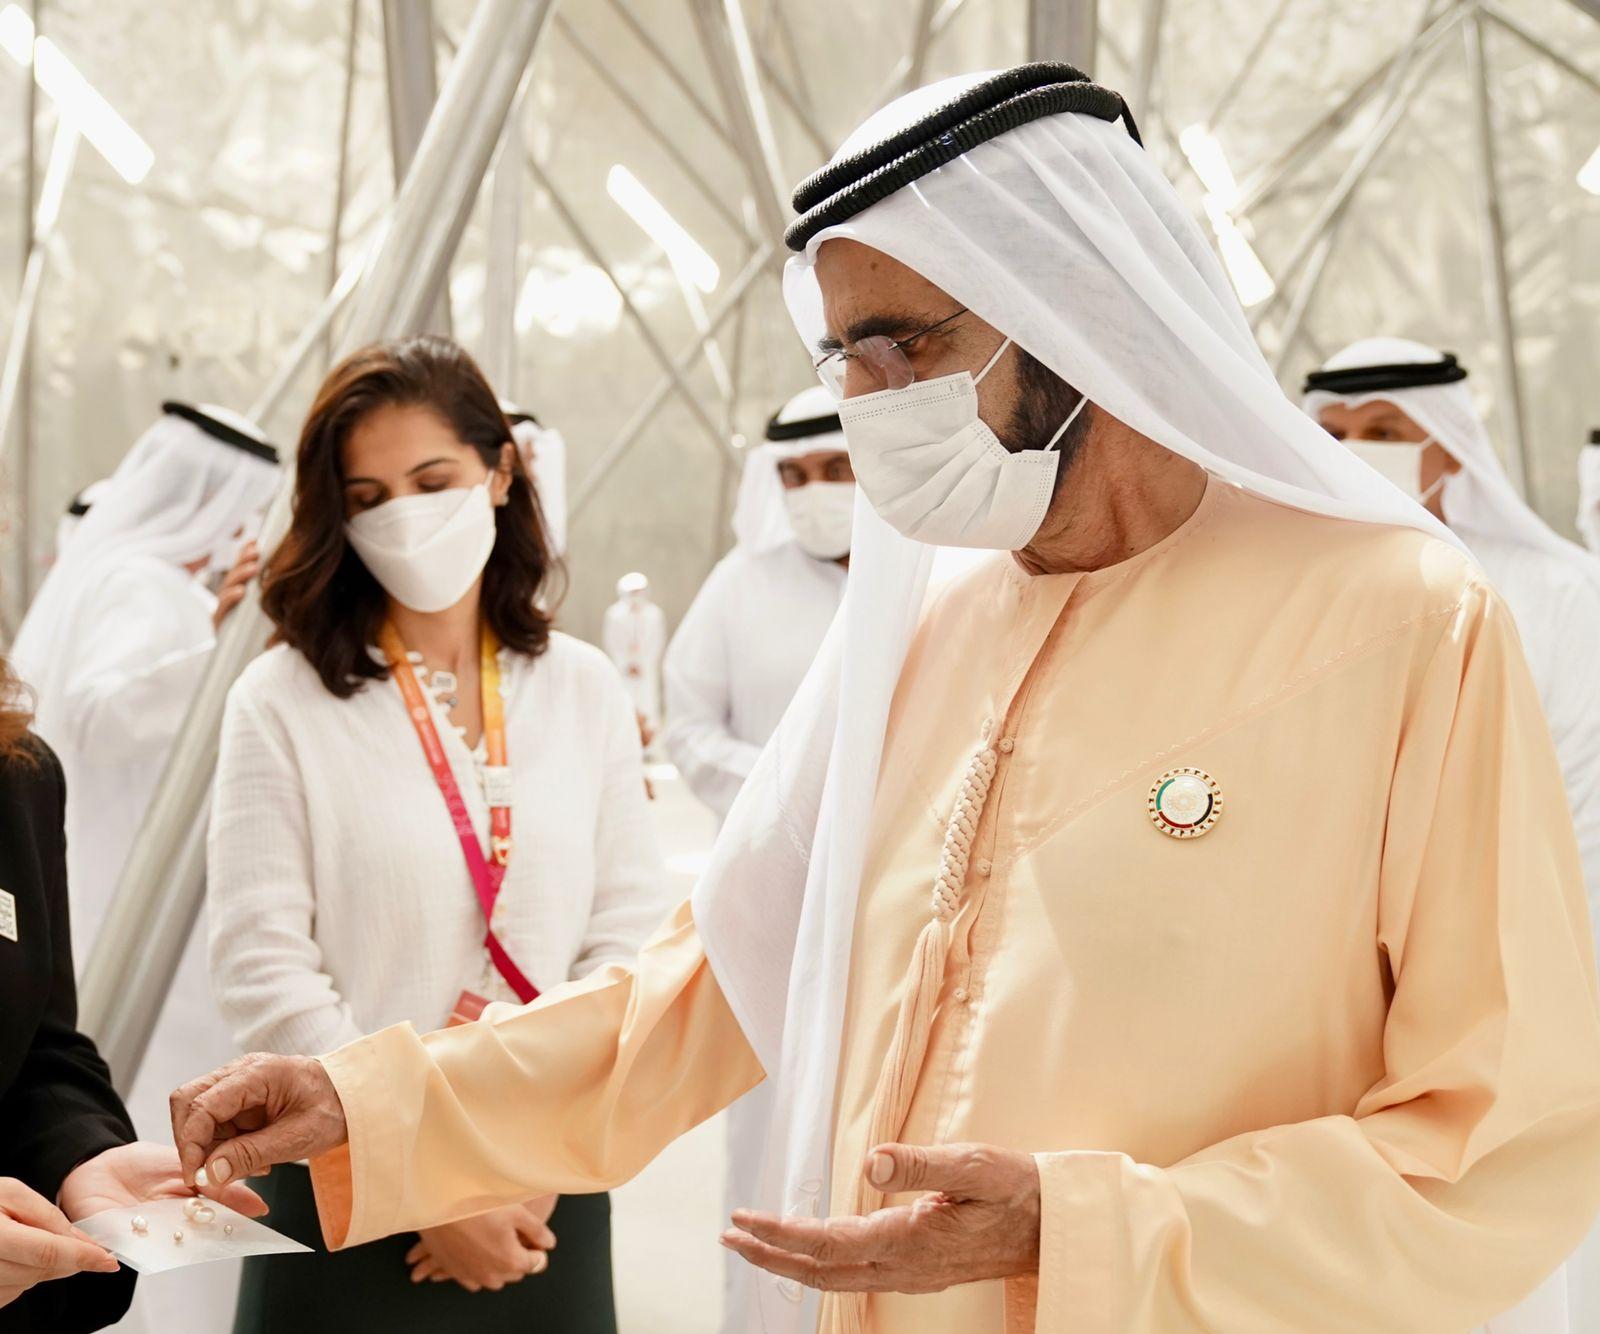 His Highness Sheikh Mohammed bin Rashid Al Maktoum - Mohammed bin Rashid visits the pavilions of Bahrain, Qatar, Kuwait and Russia at Expo 2020 Dubai